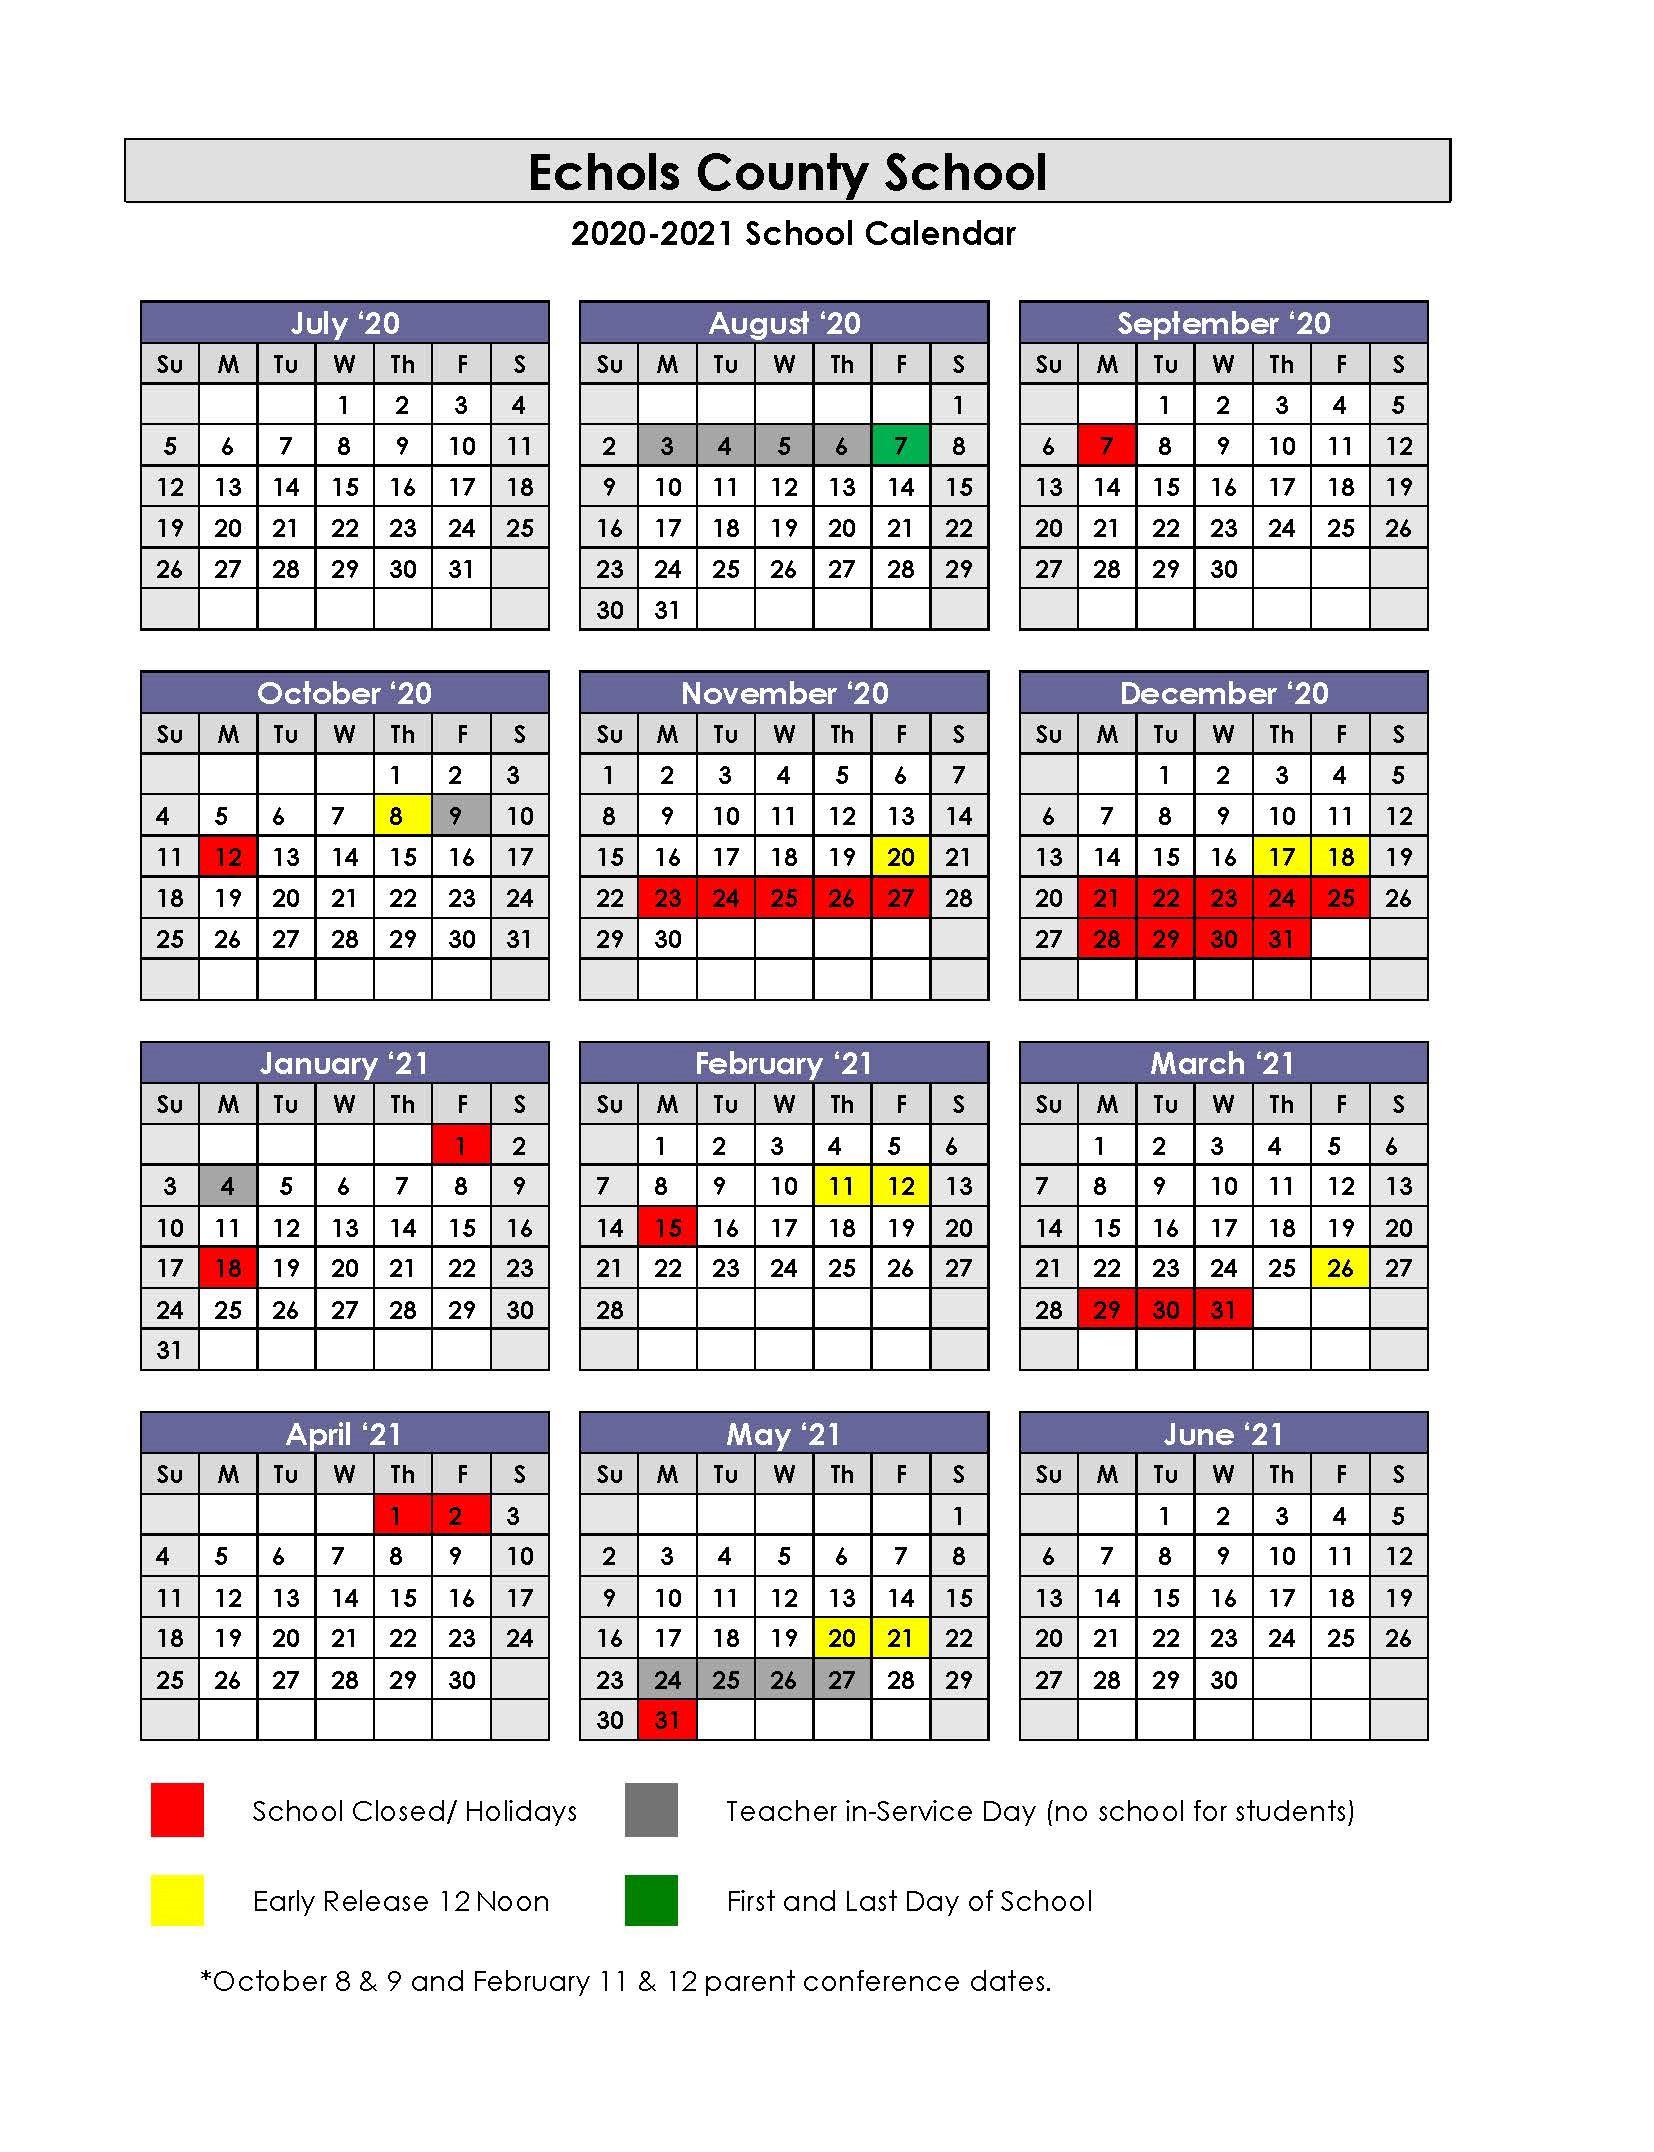 FY21 Echols Yearlong School Calendar